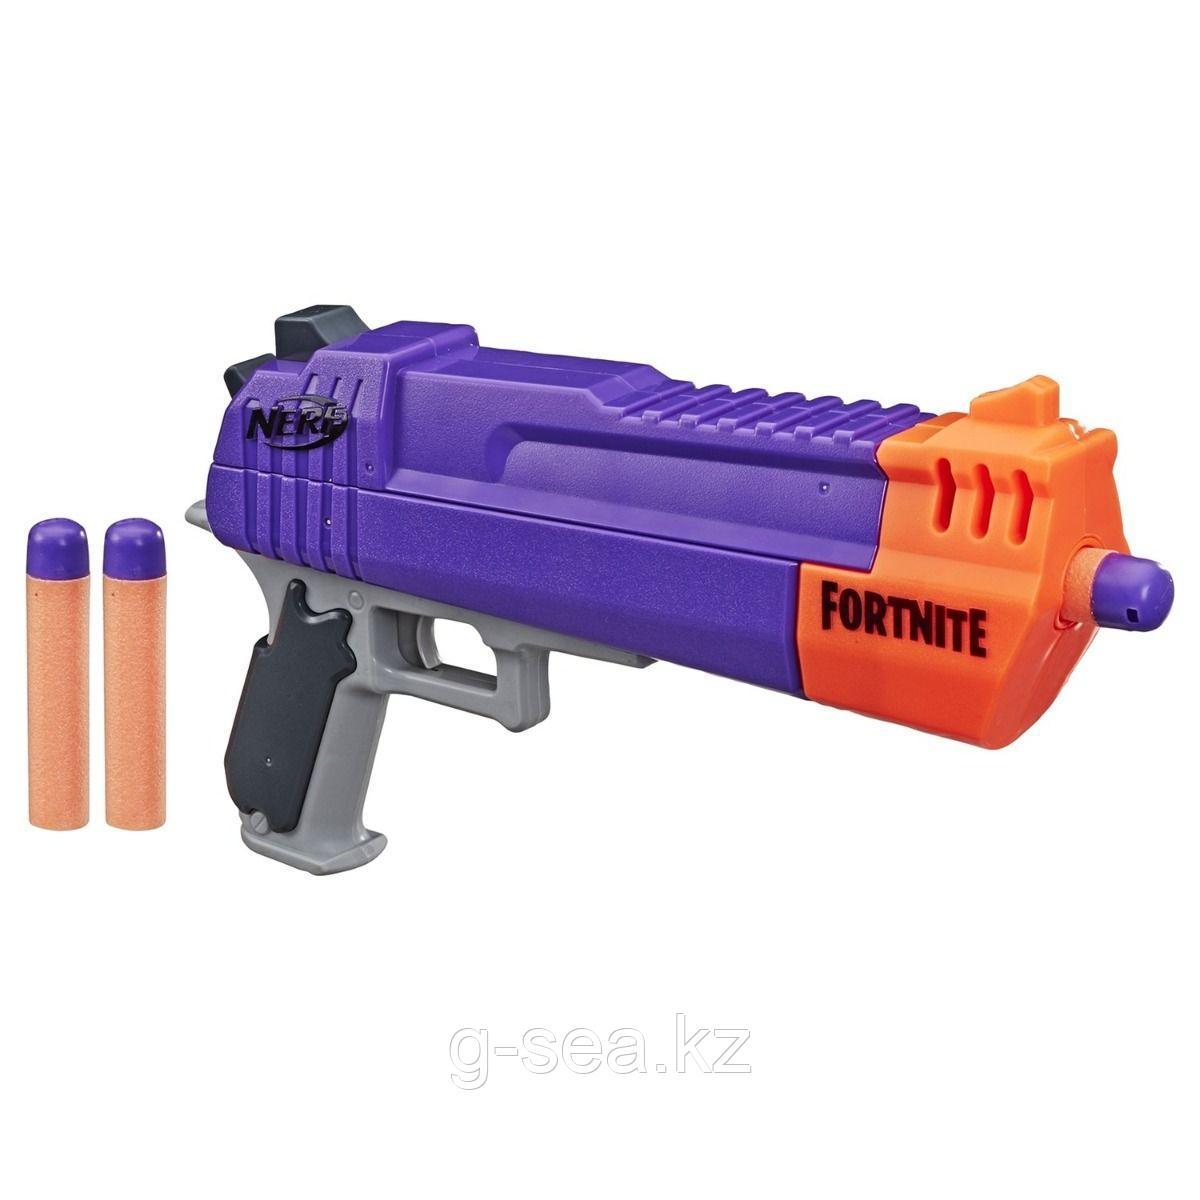 Nerf: Fortnite. Револьвер